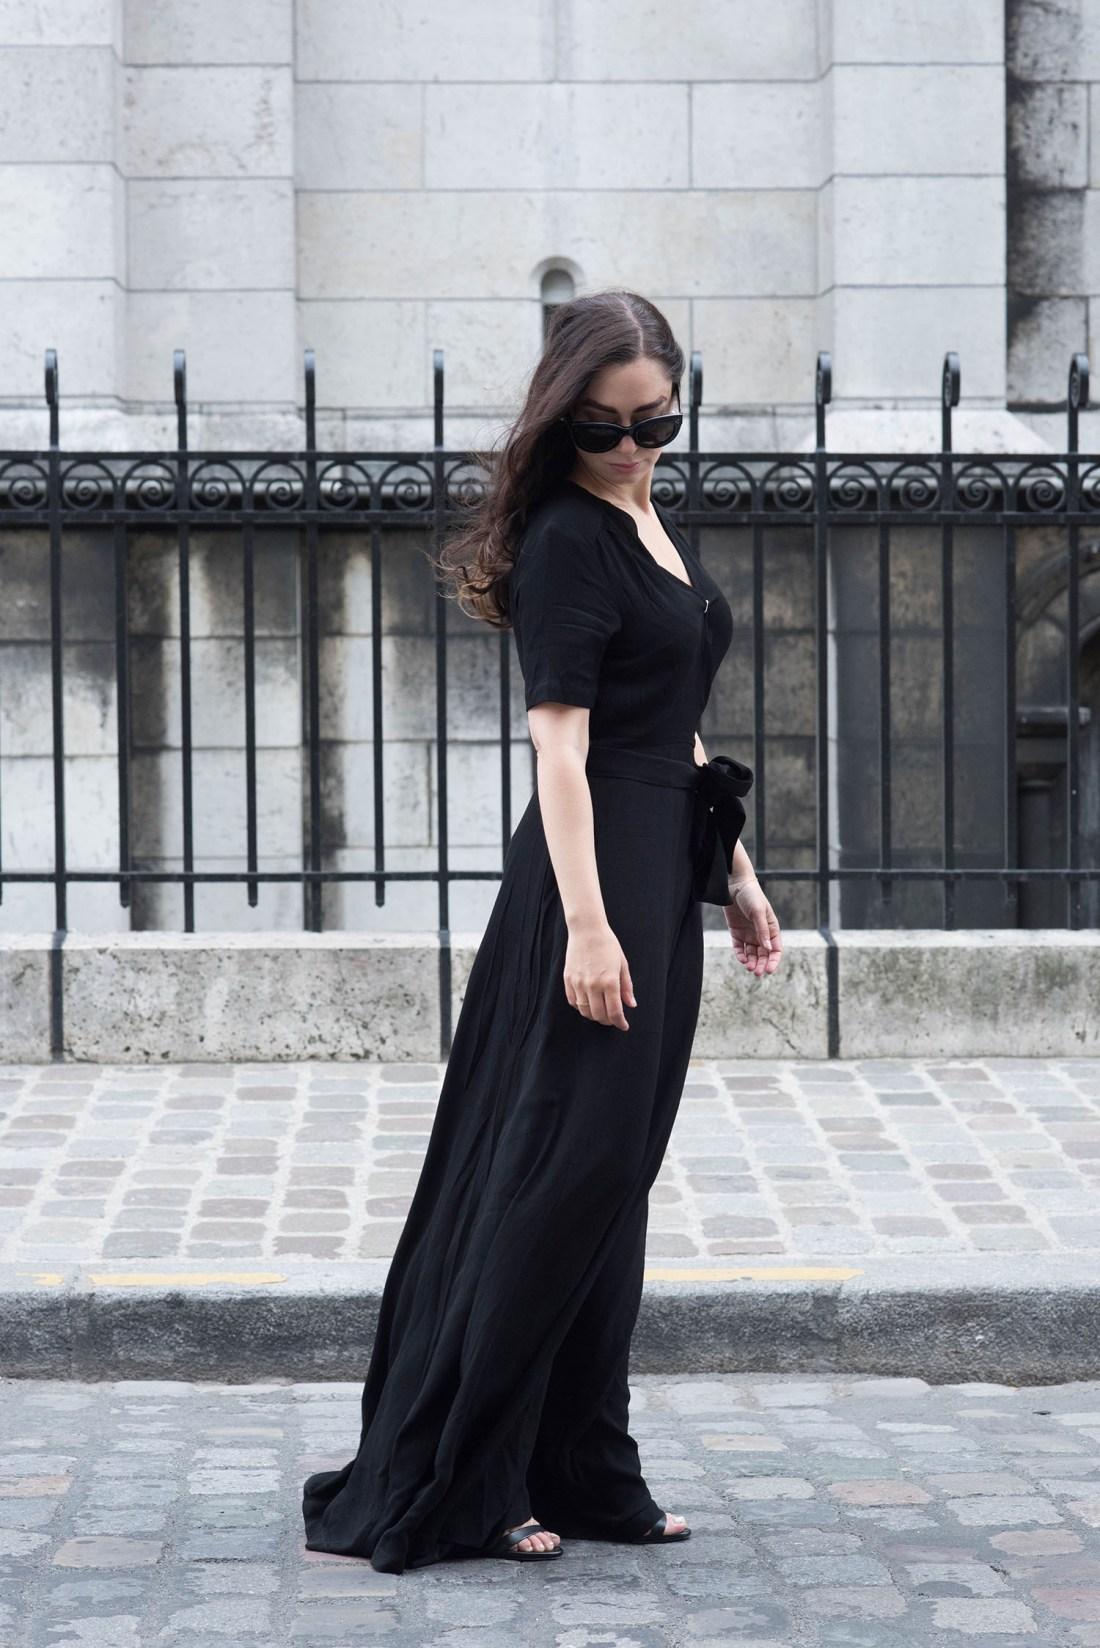 Fashion blogger Cee Fardoe of Coco & Vera wears a black Ivy & Oak maxi dress and Celine Audrey sunglasses in Paris